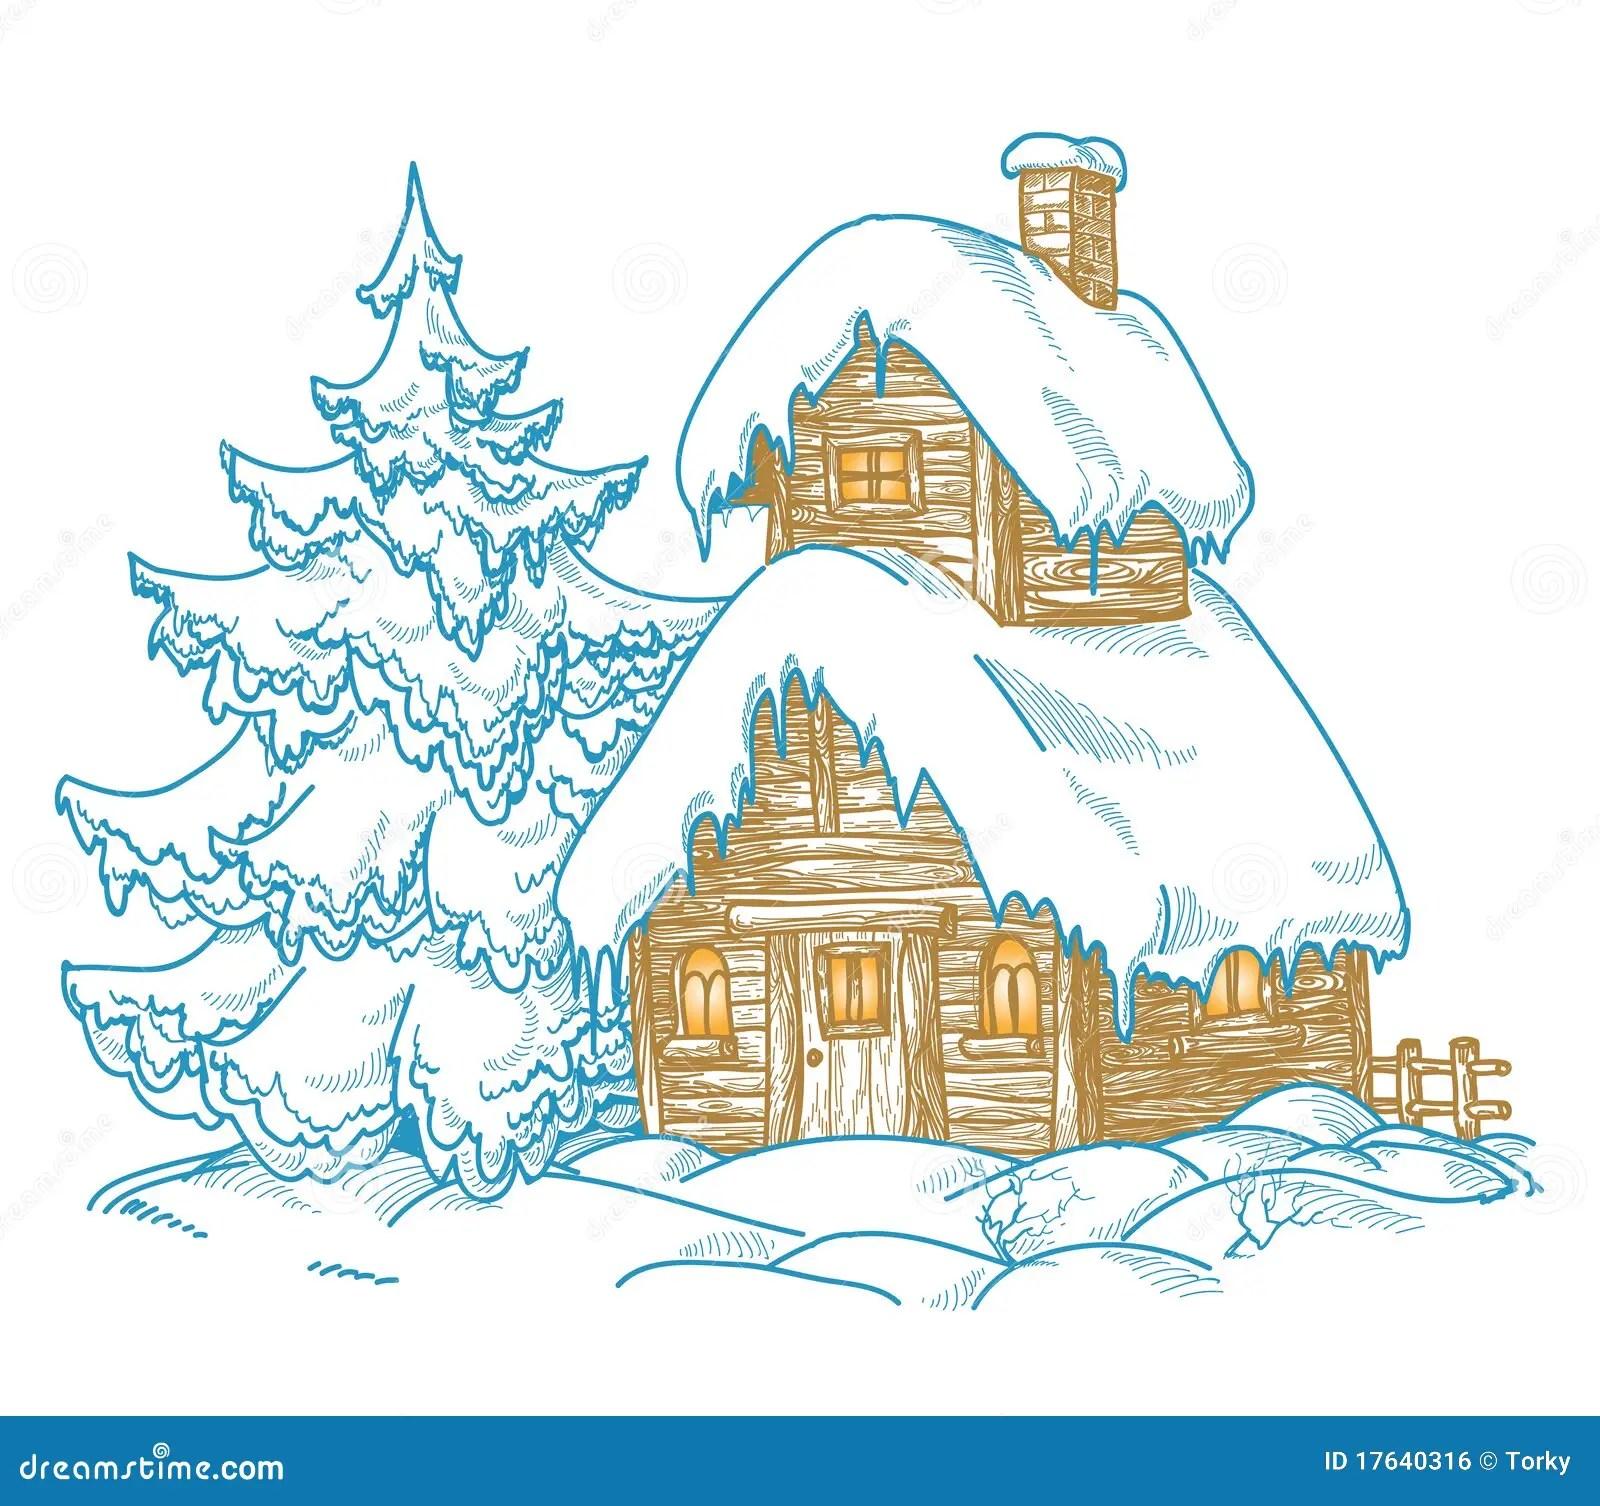 Cartoon winter scene stock vector. Illustration of cold - 17640316